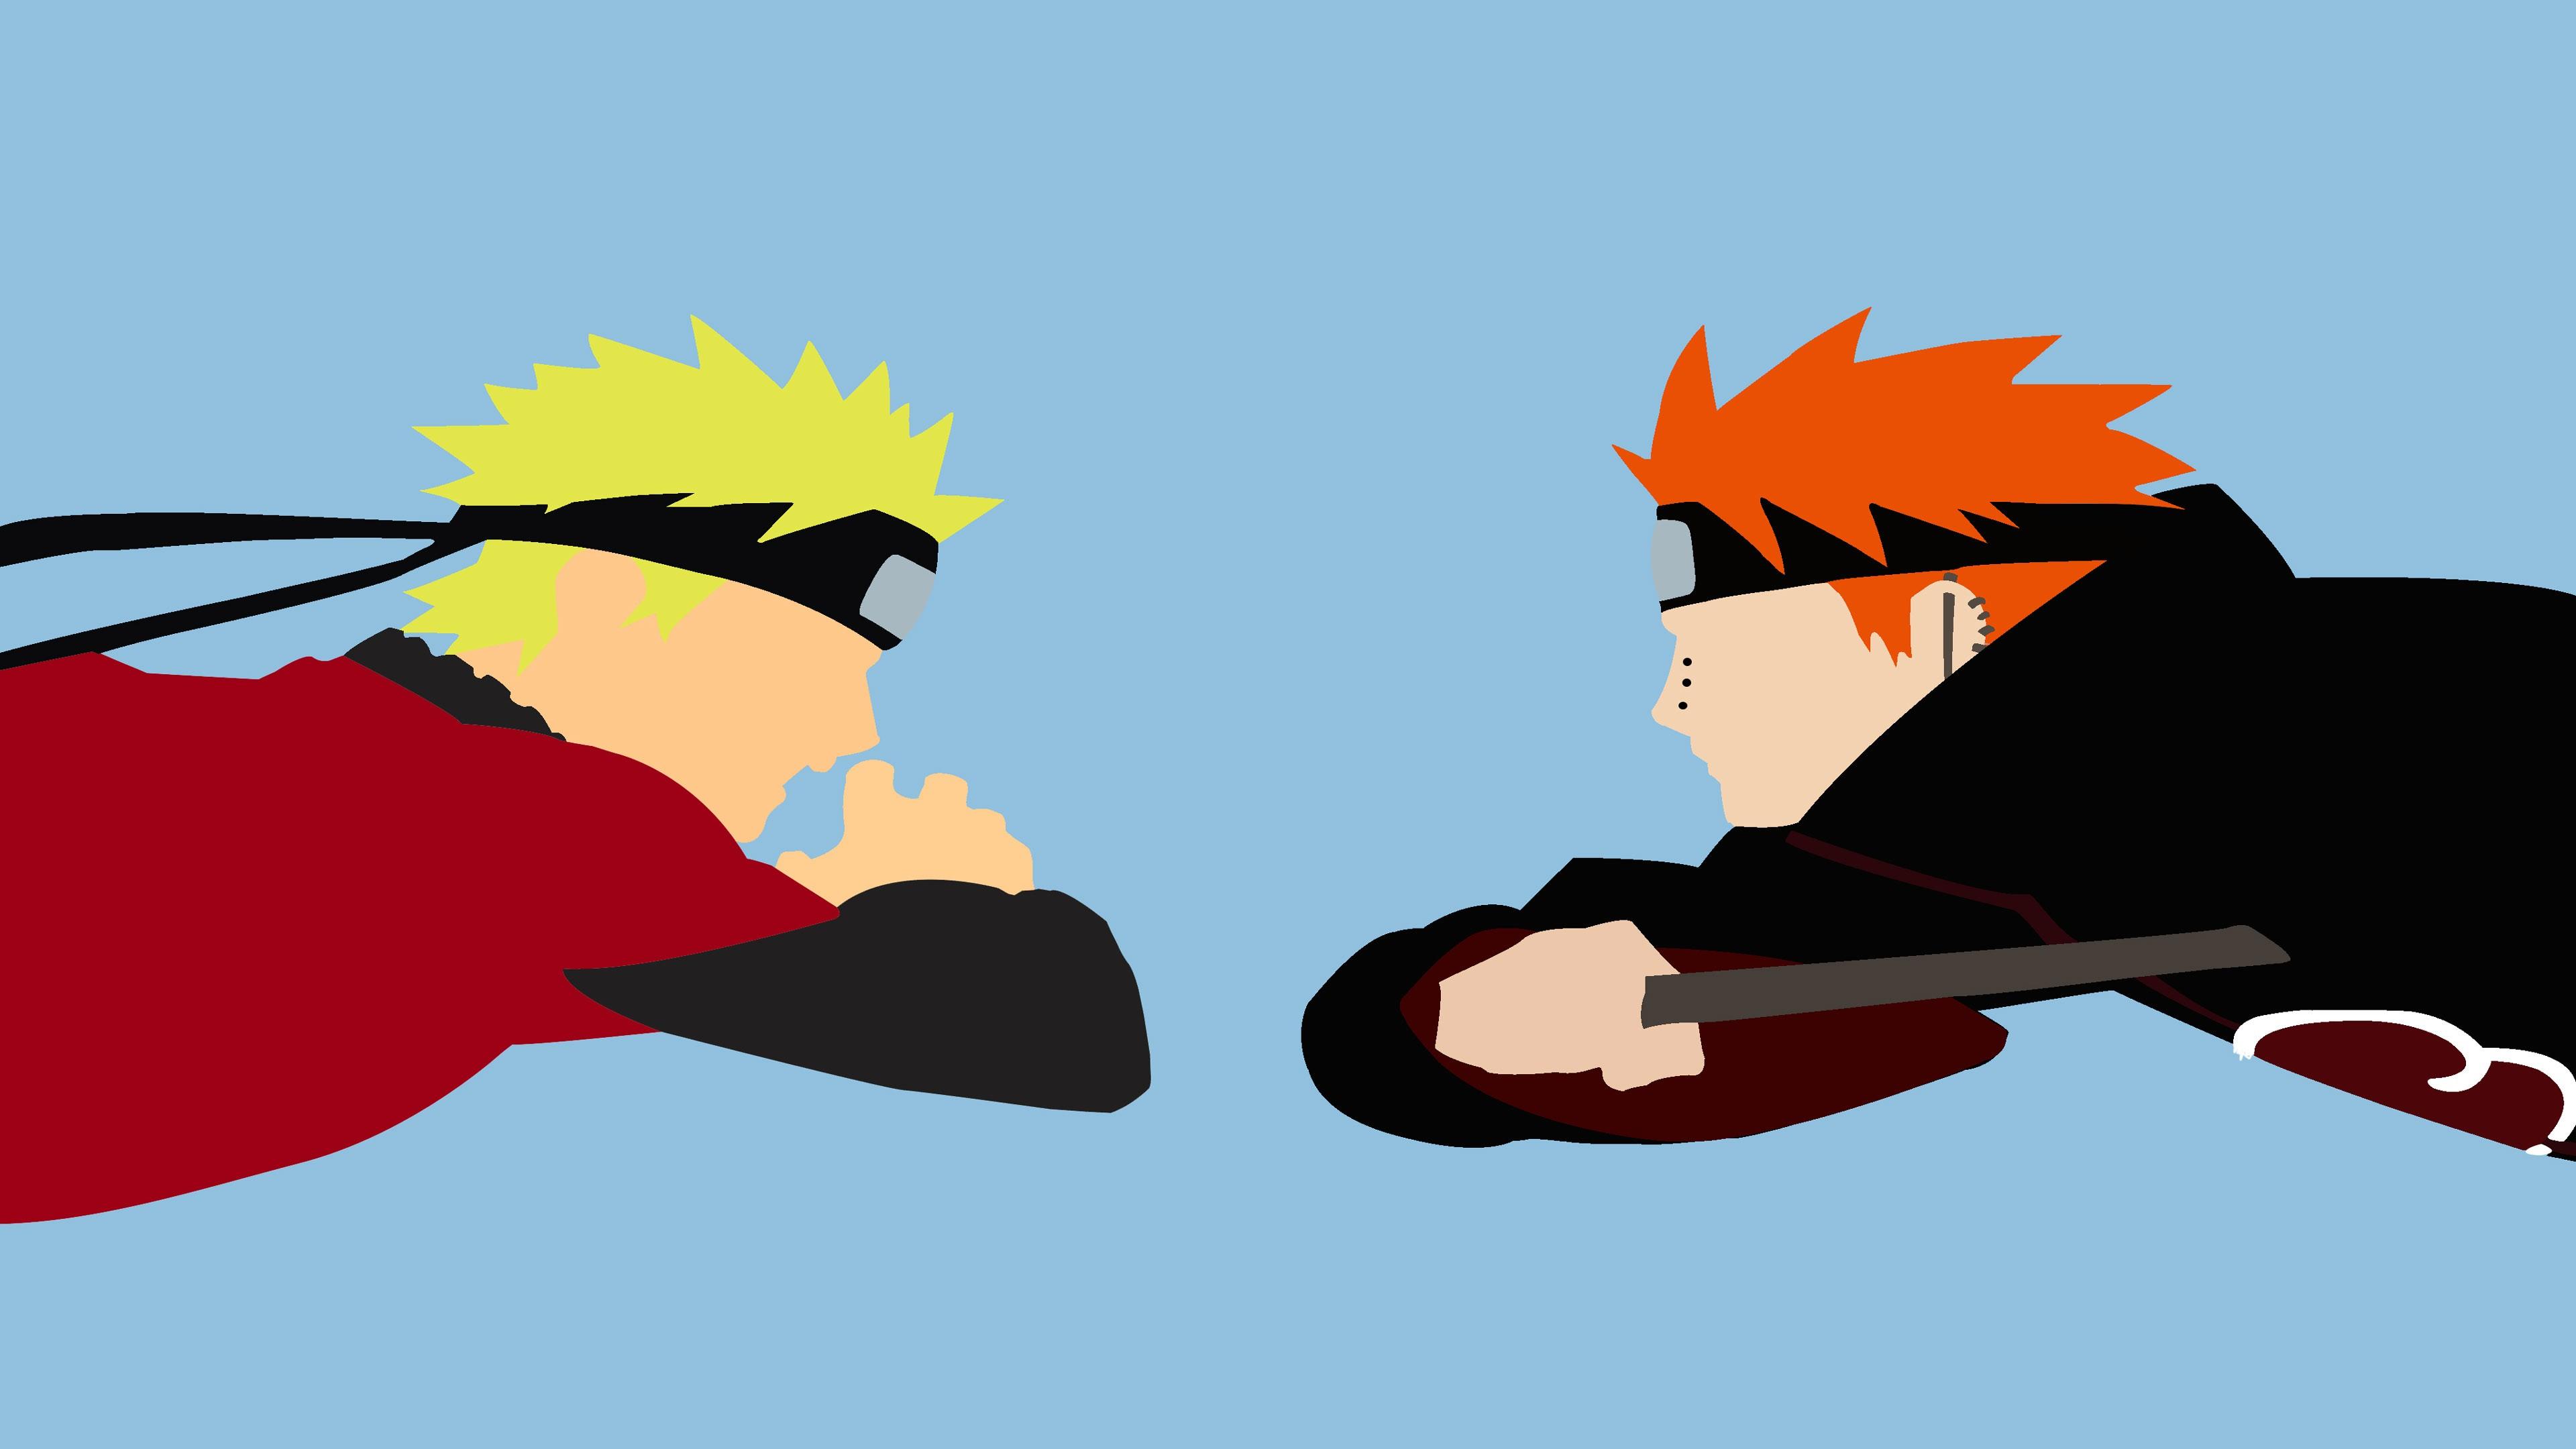 Fan club wallpaper abyss naruto. Akatsuki (Naruto) Obito Uchiha And Jugo 4K HD Anime ...